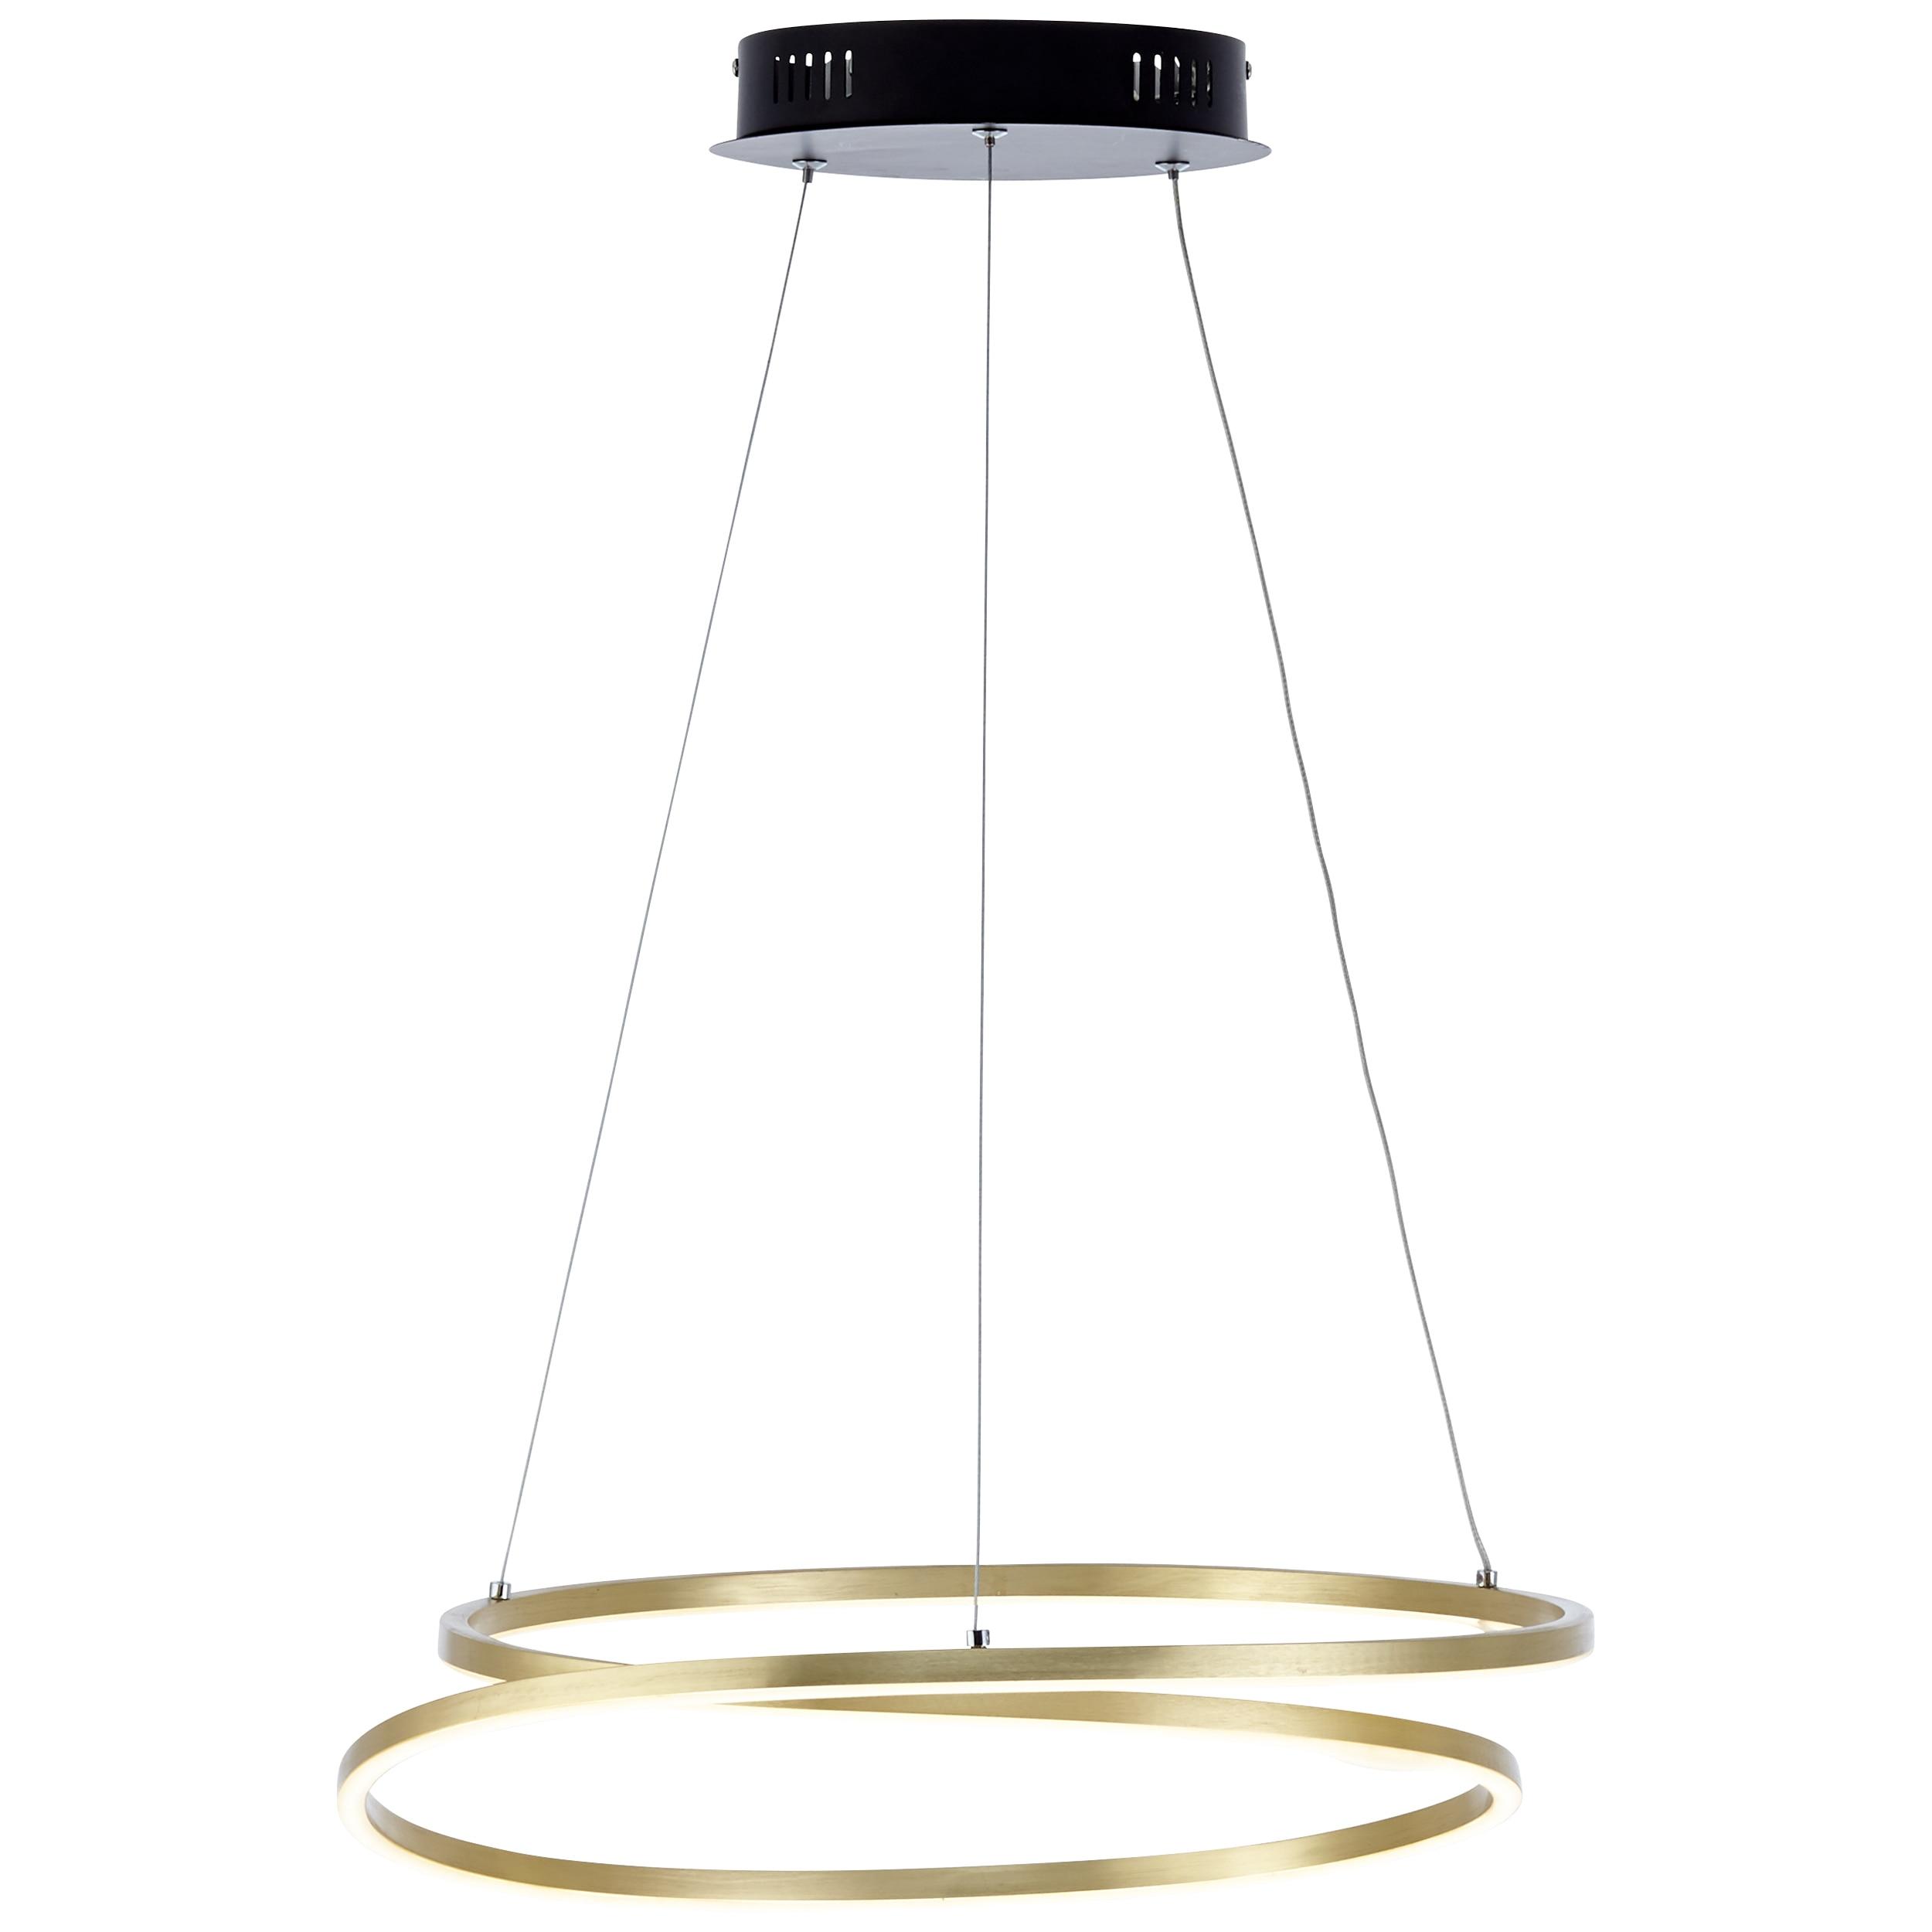 Brilliant Leuchten Barrie LED Pendelleuchte 50cm schwarz/messing